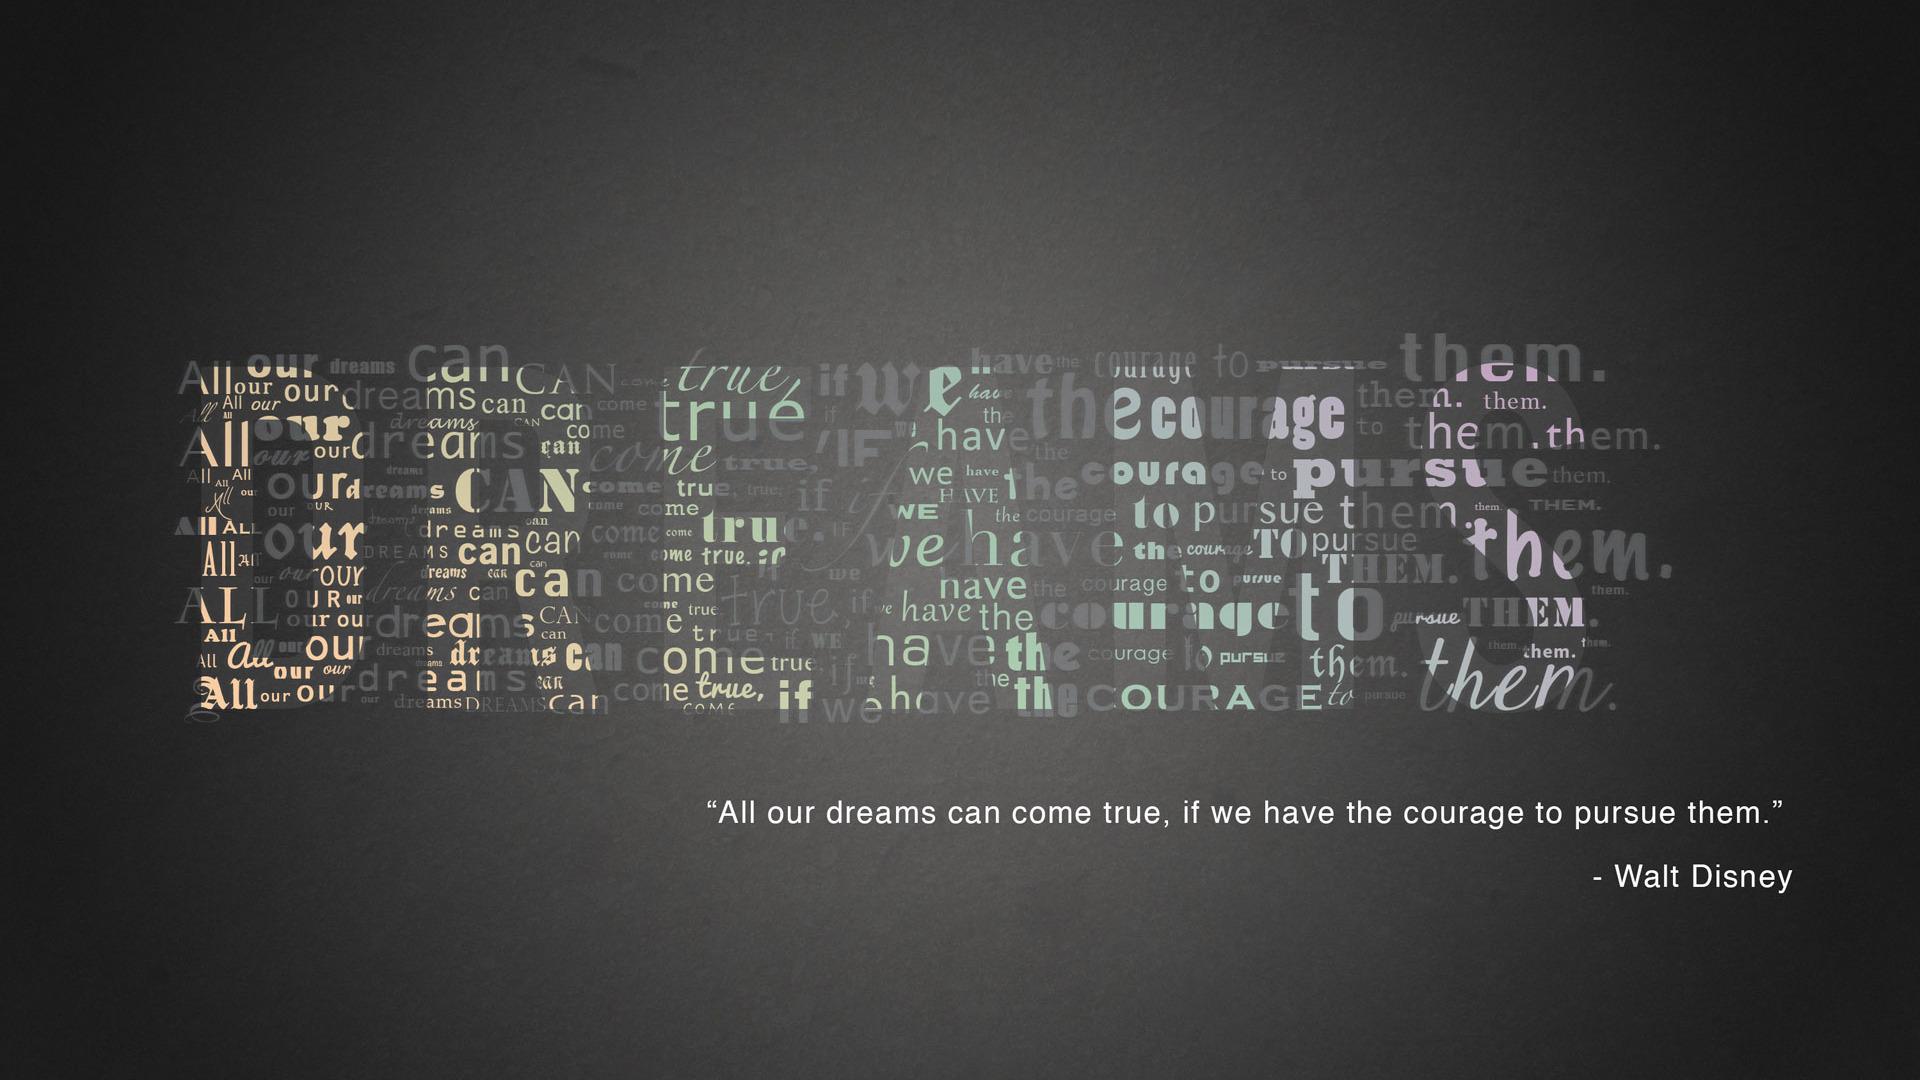 walt disney quote quote hd wallpaper 1920x1080 9802jpg 1920x1080